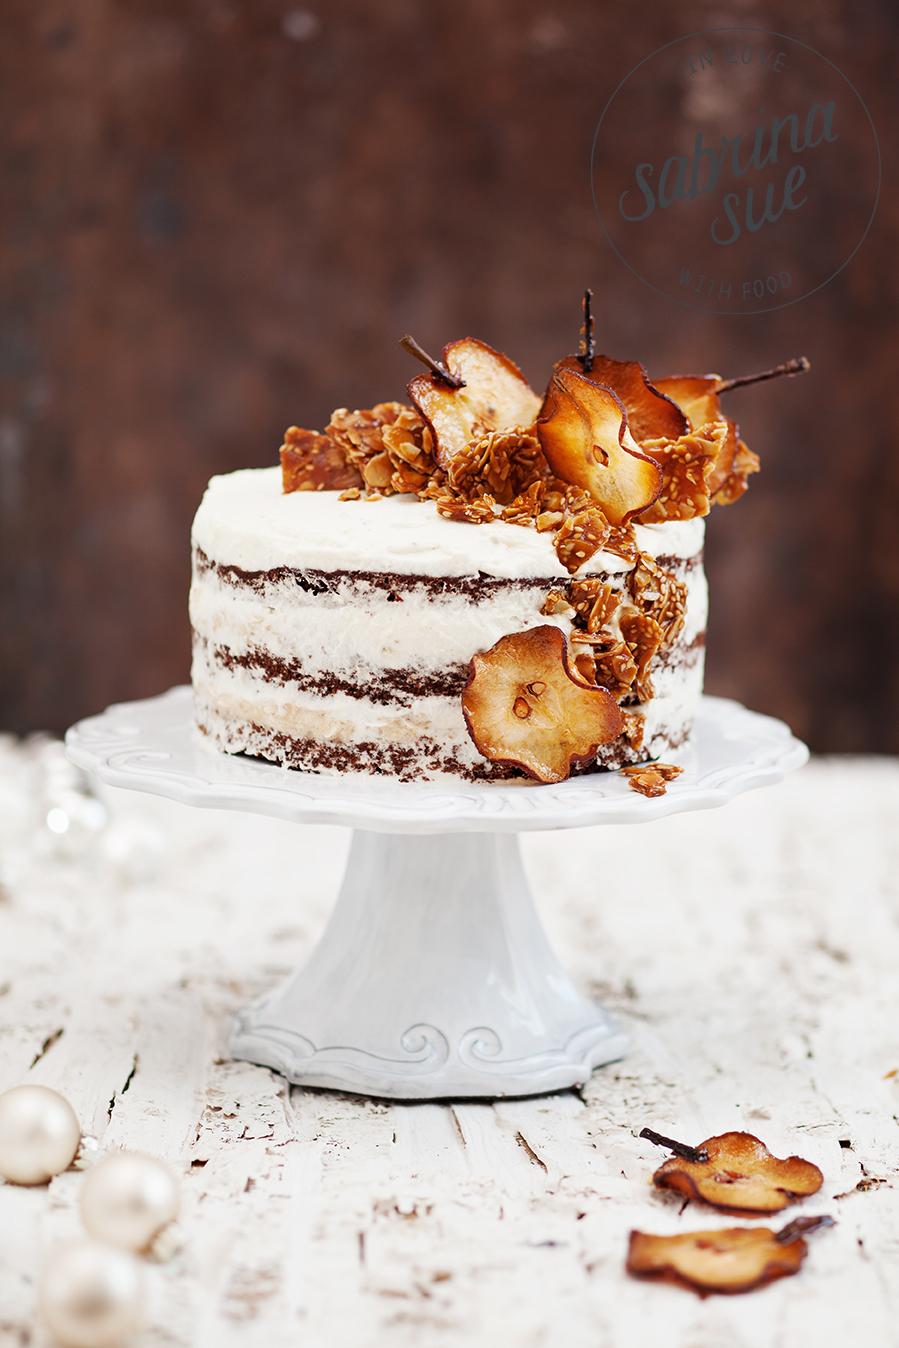 Birnen Kokos Torte & Sesam Mandel Krokant